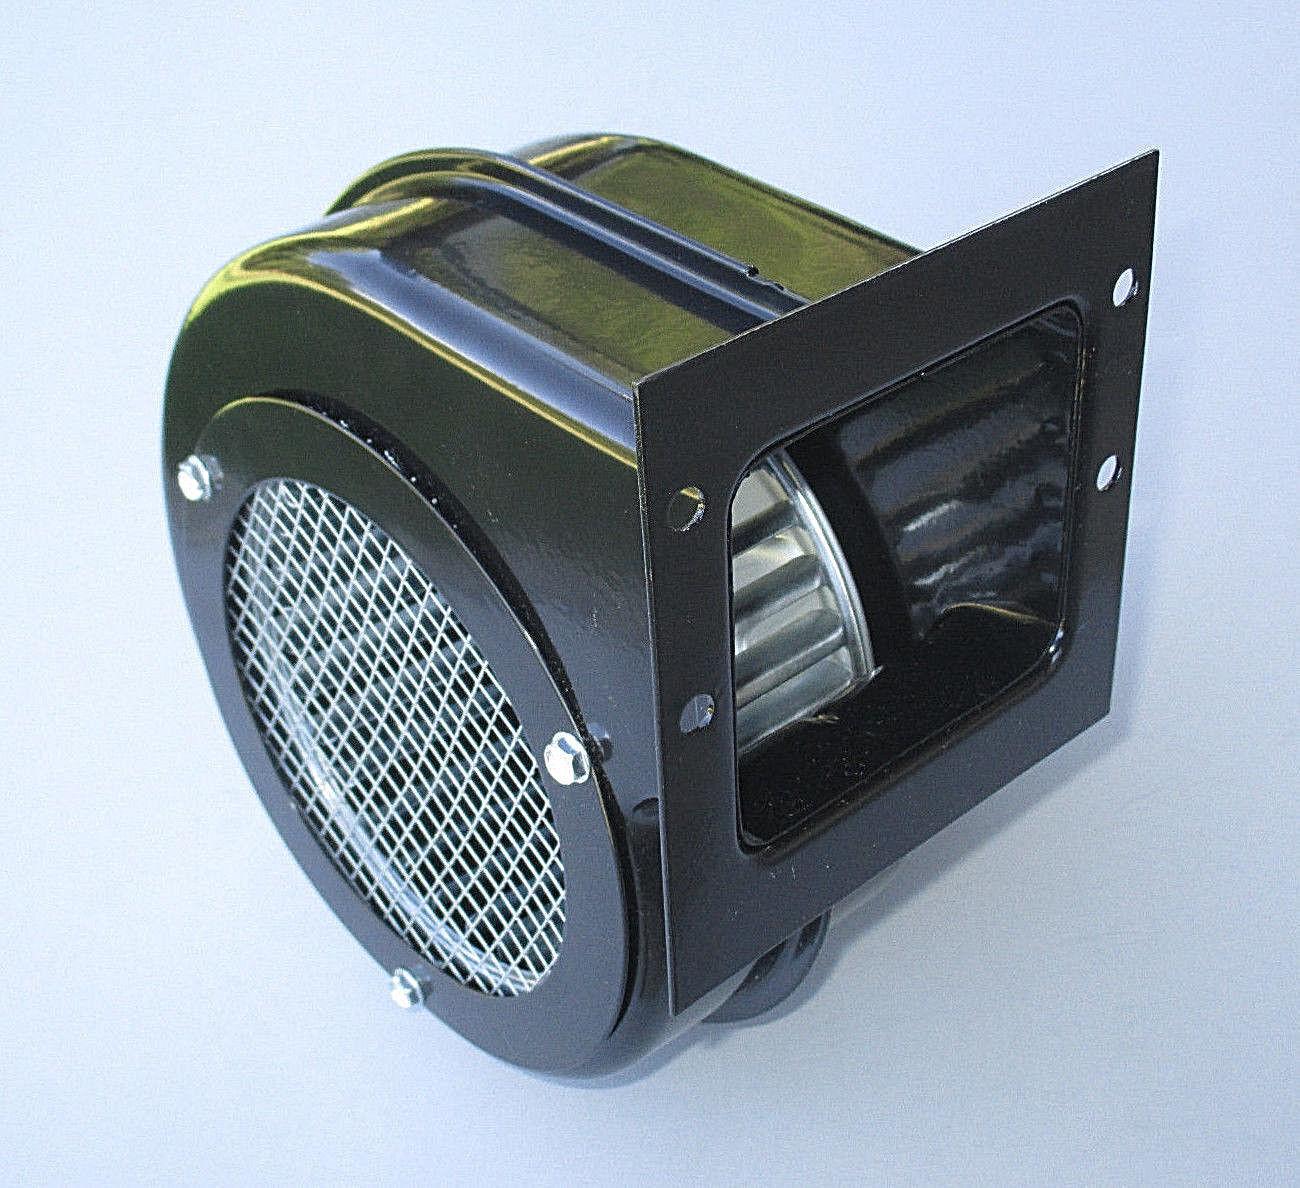 King & Ashley pellet stove 80472A Convection Distribution Blower Fan, US Stove